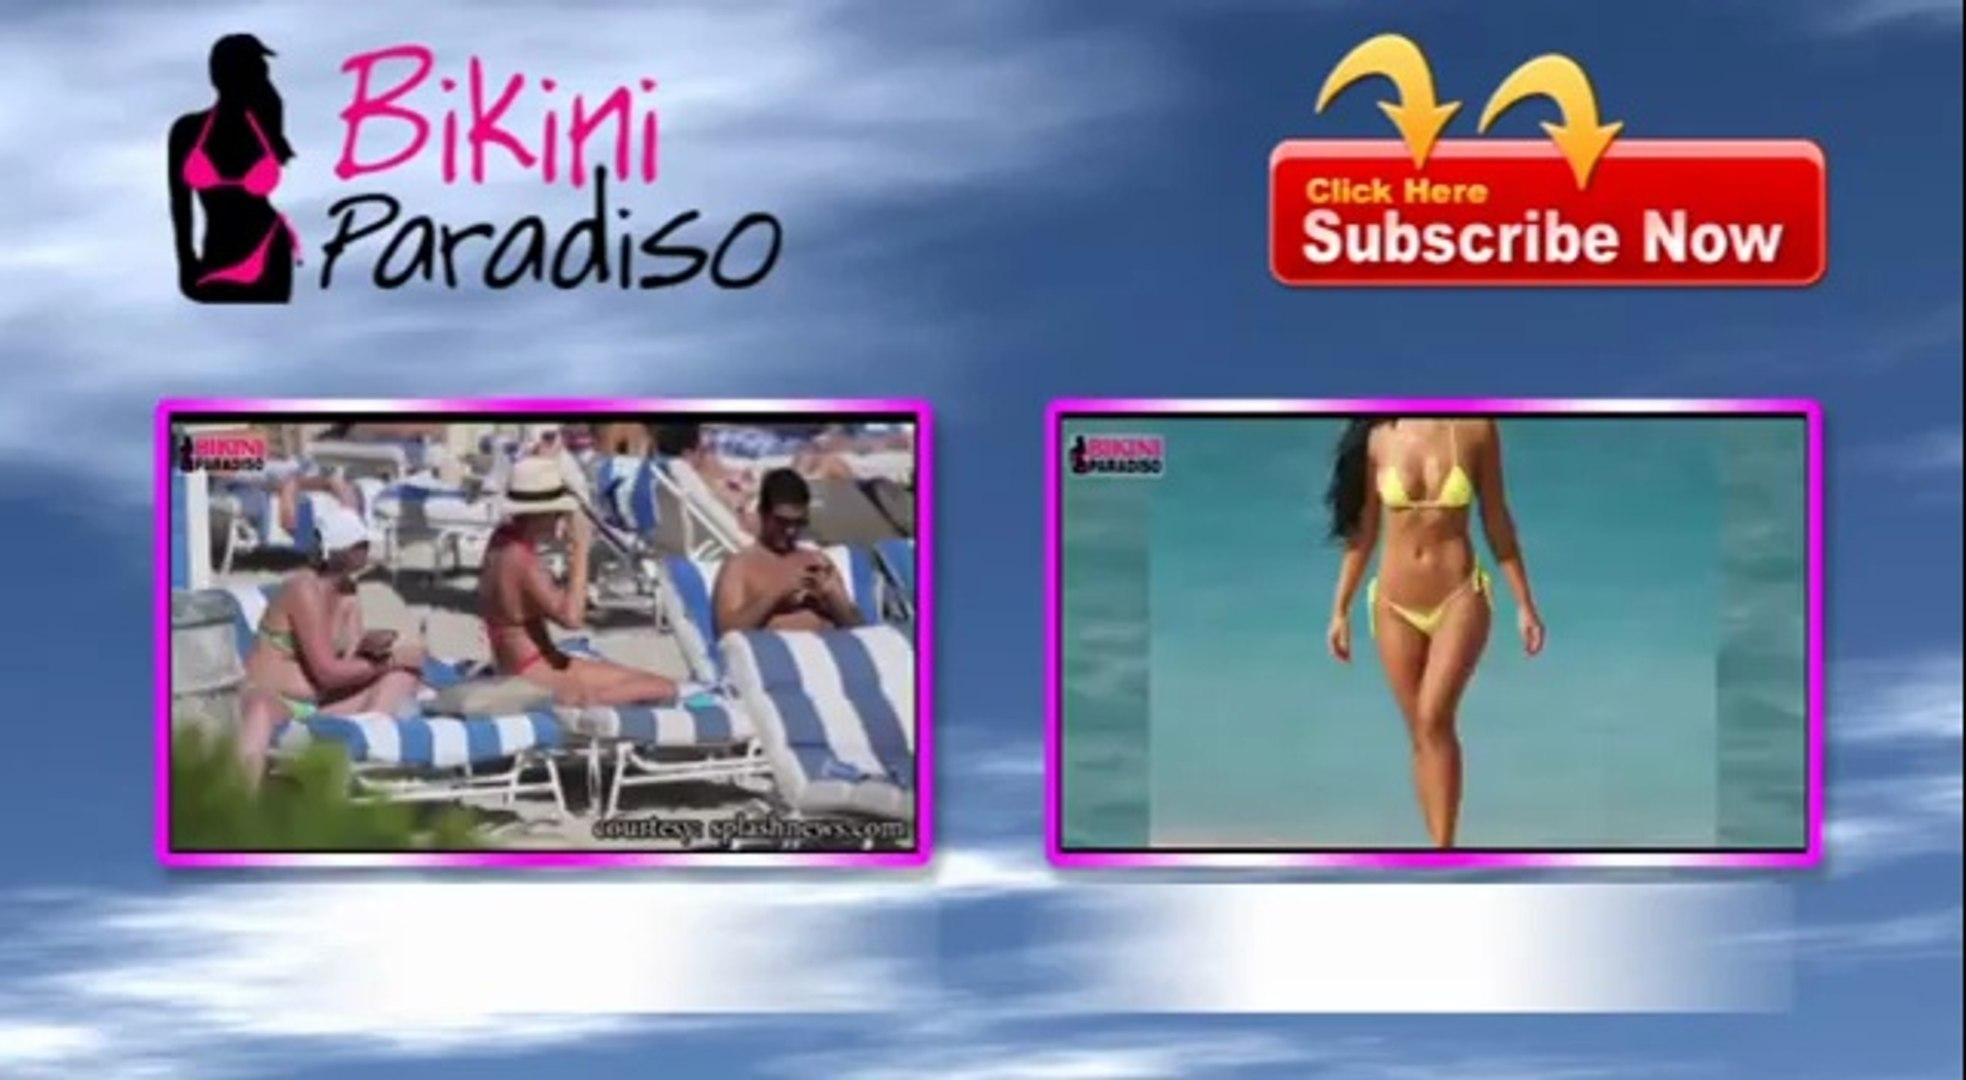 Lauren Stones Shows Off Her Bikini Body bikini paradiso FULL HD